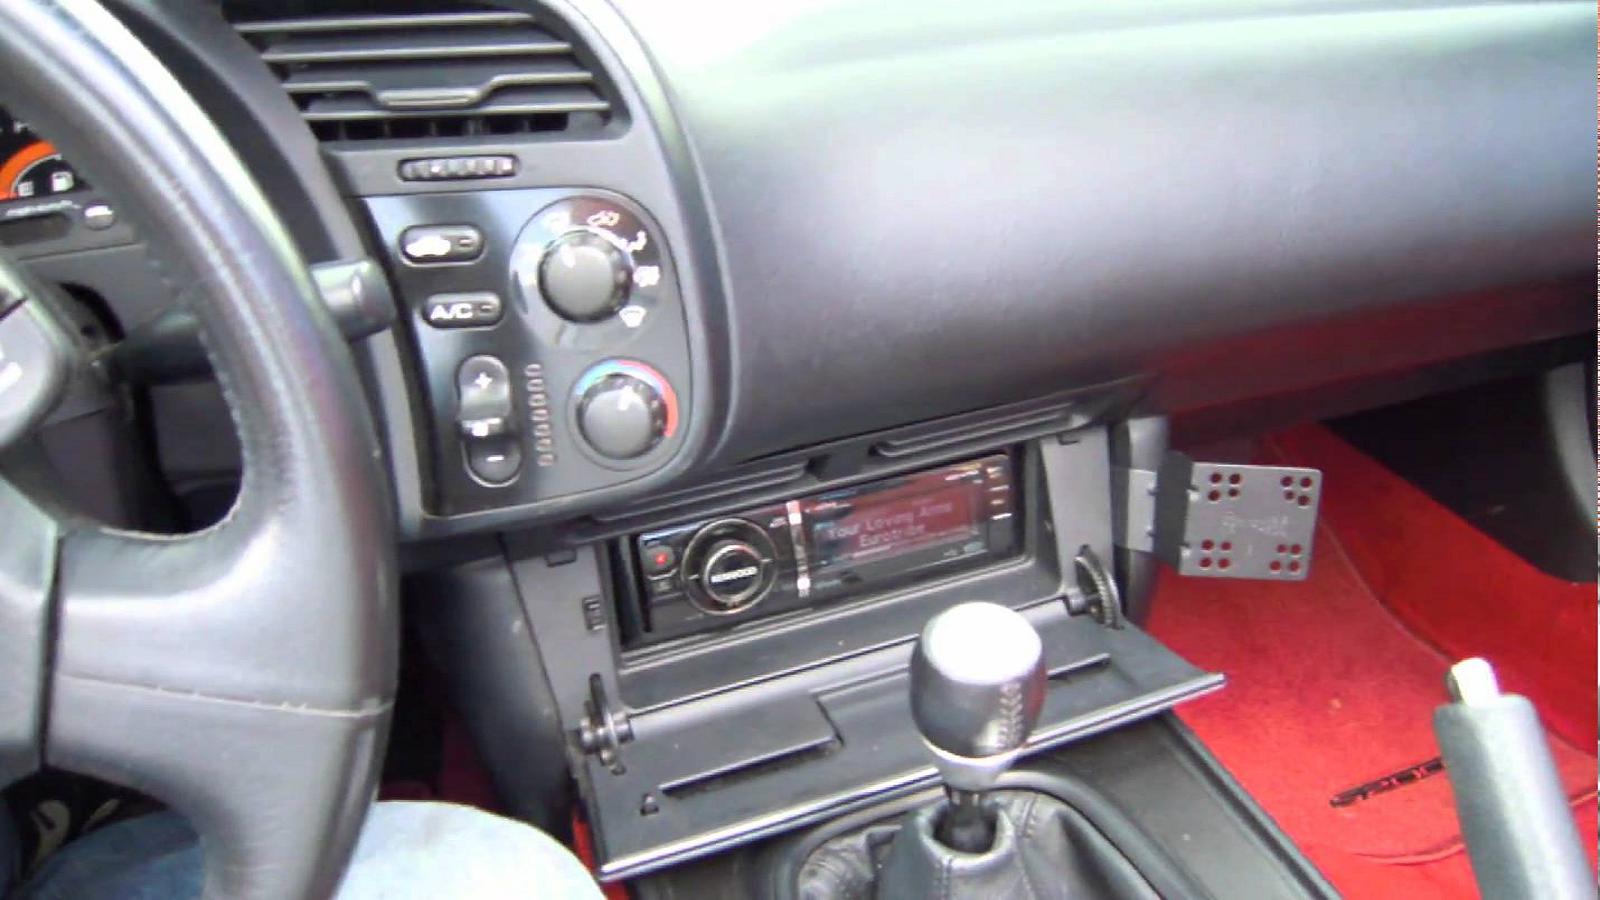 Panel-accessed audio system